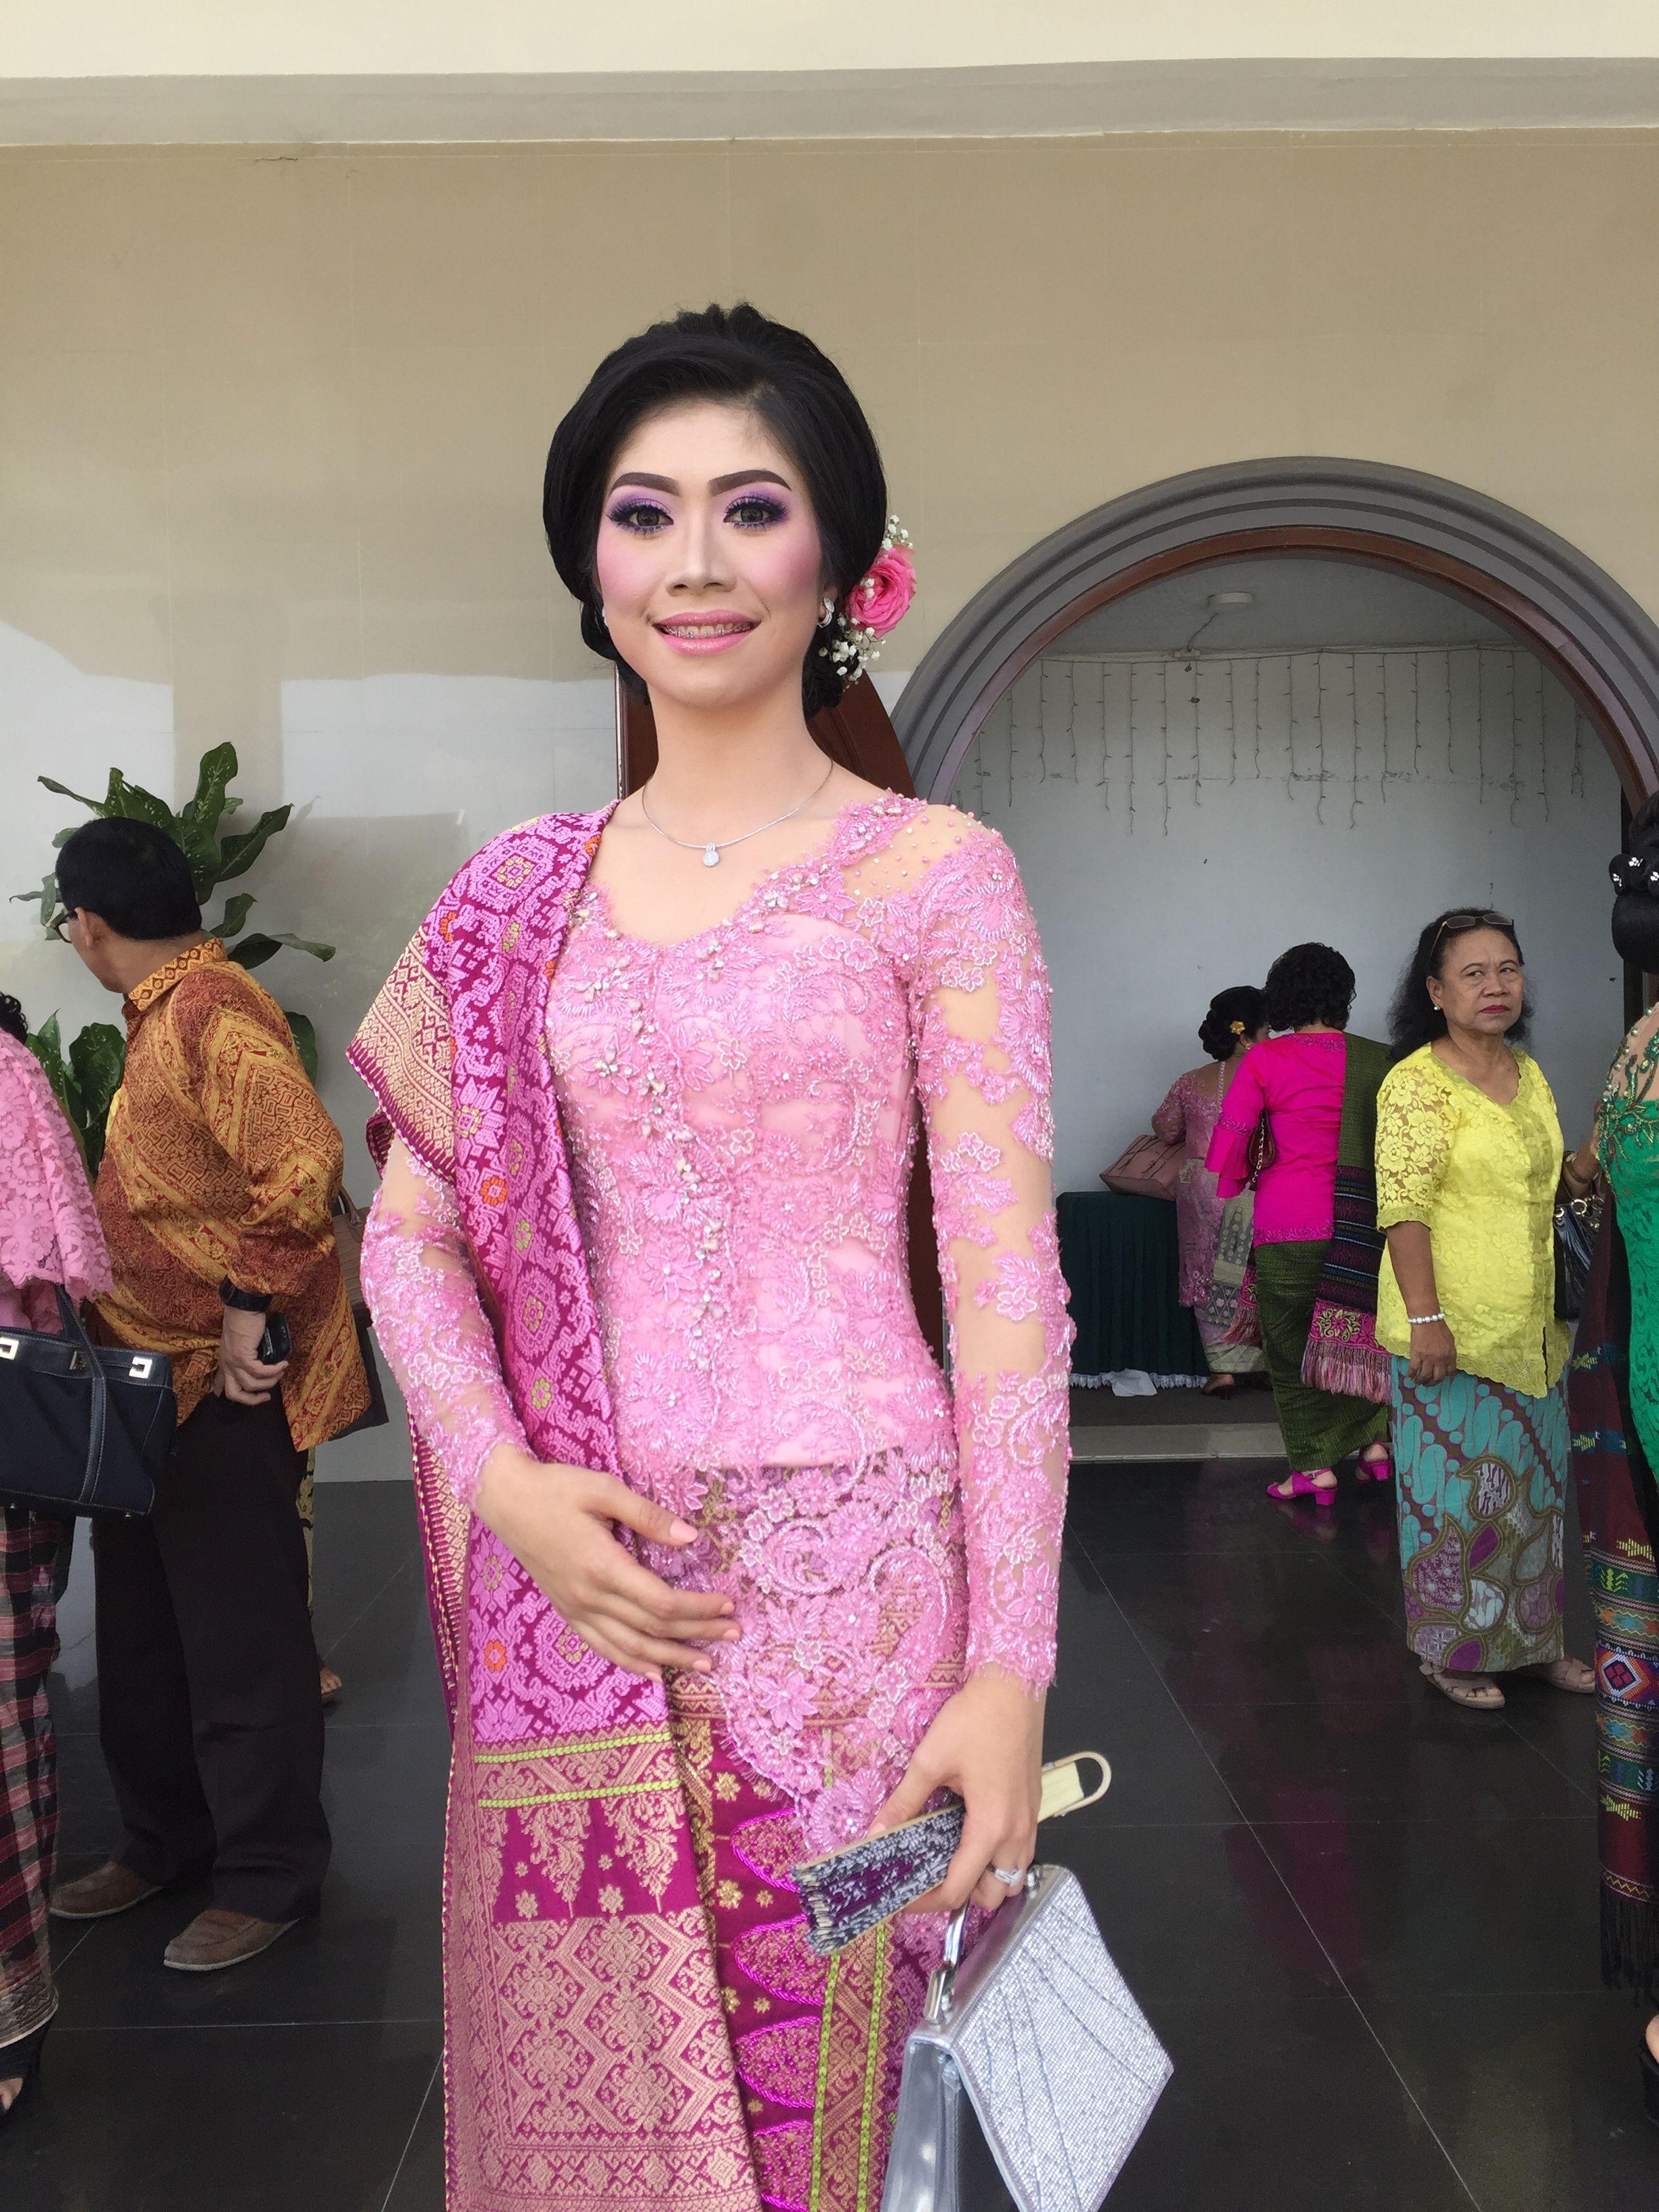 Gambar Pakaian Adat Jawa Timur